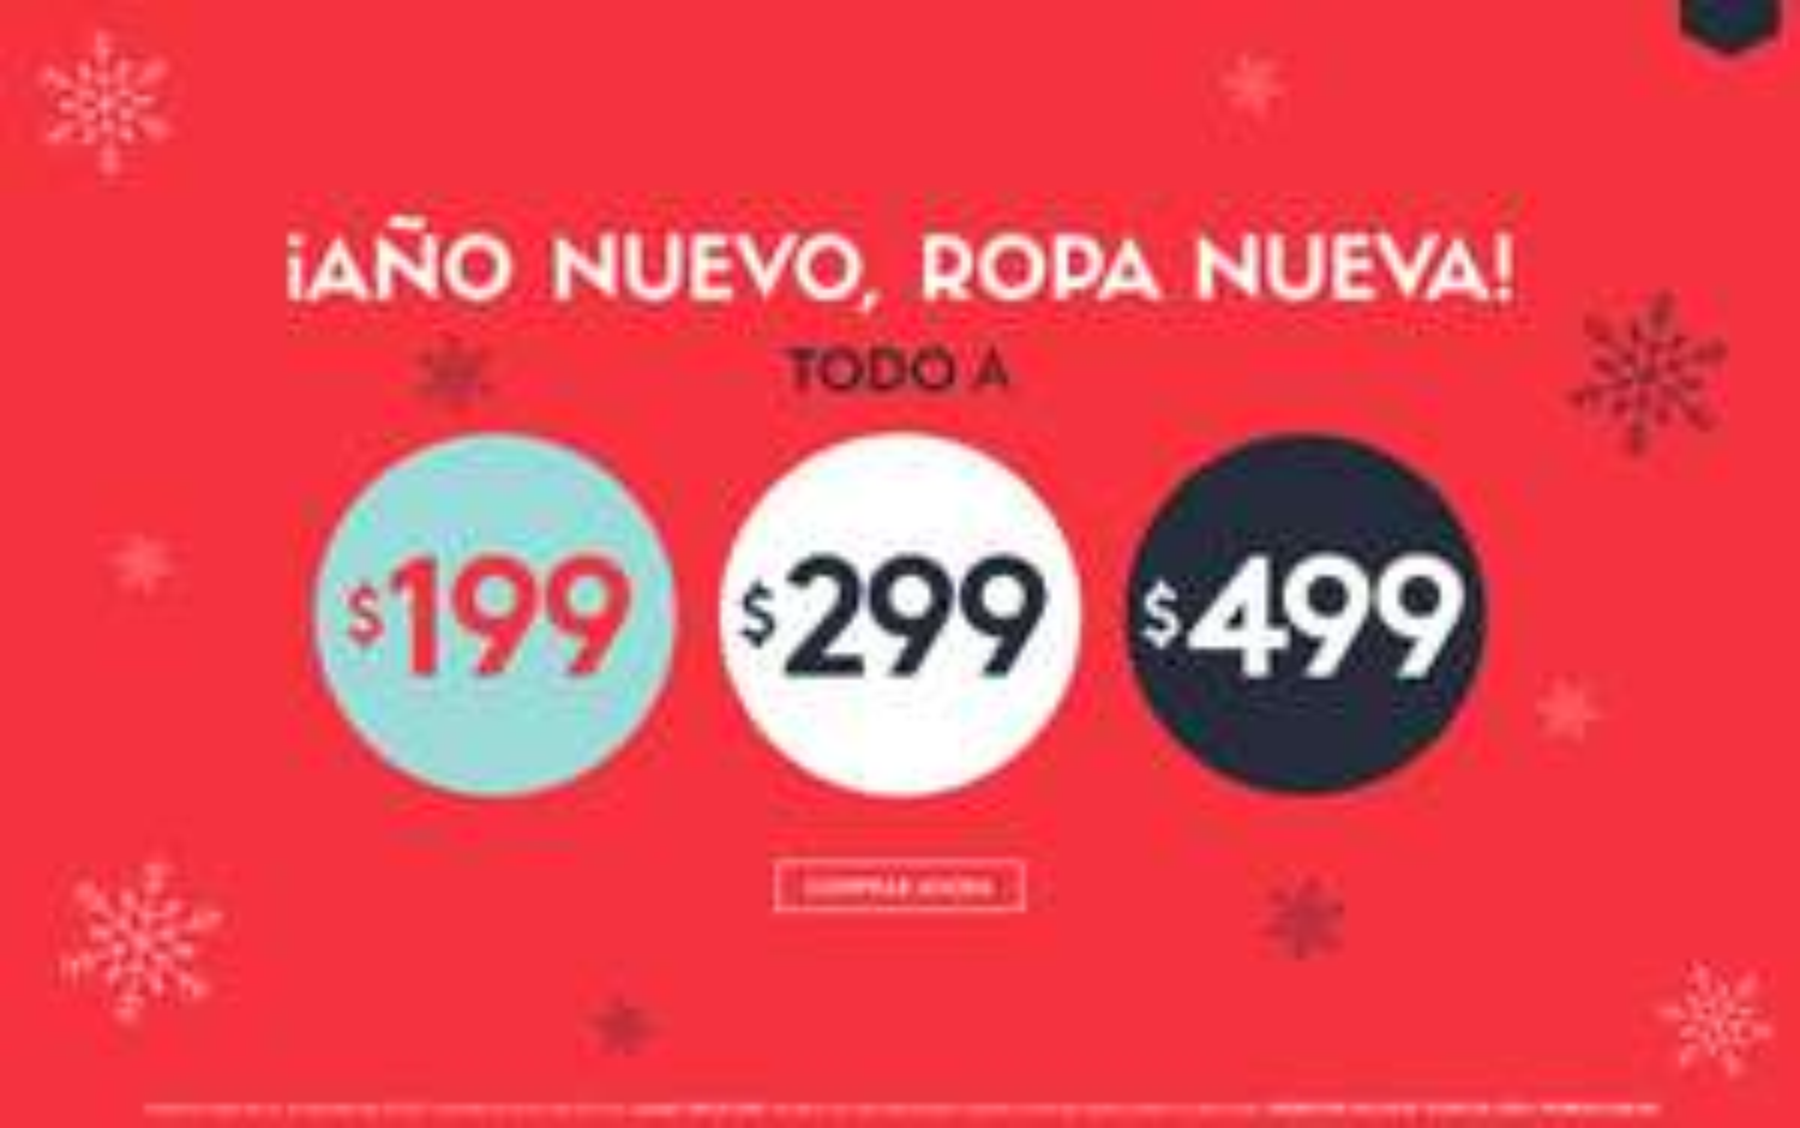 Promoda Outlet: Todo a $199, $299 y $499